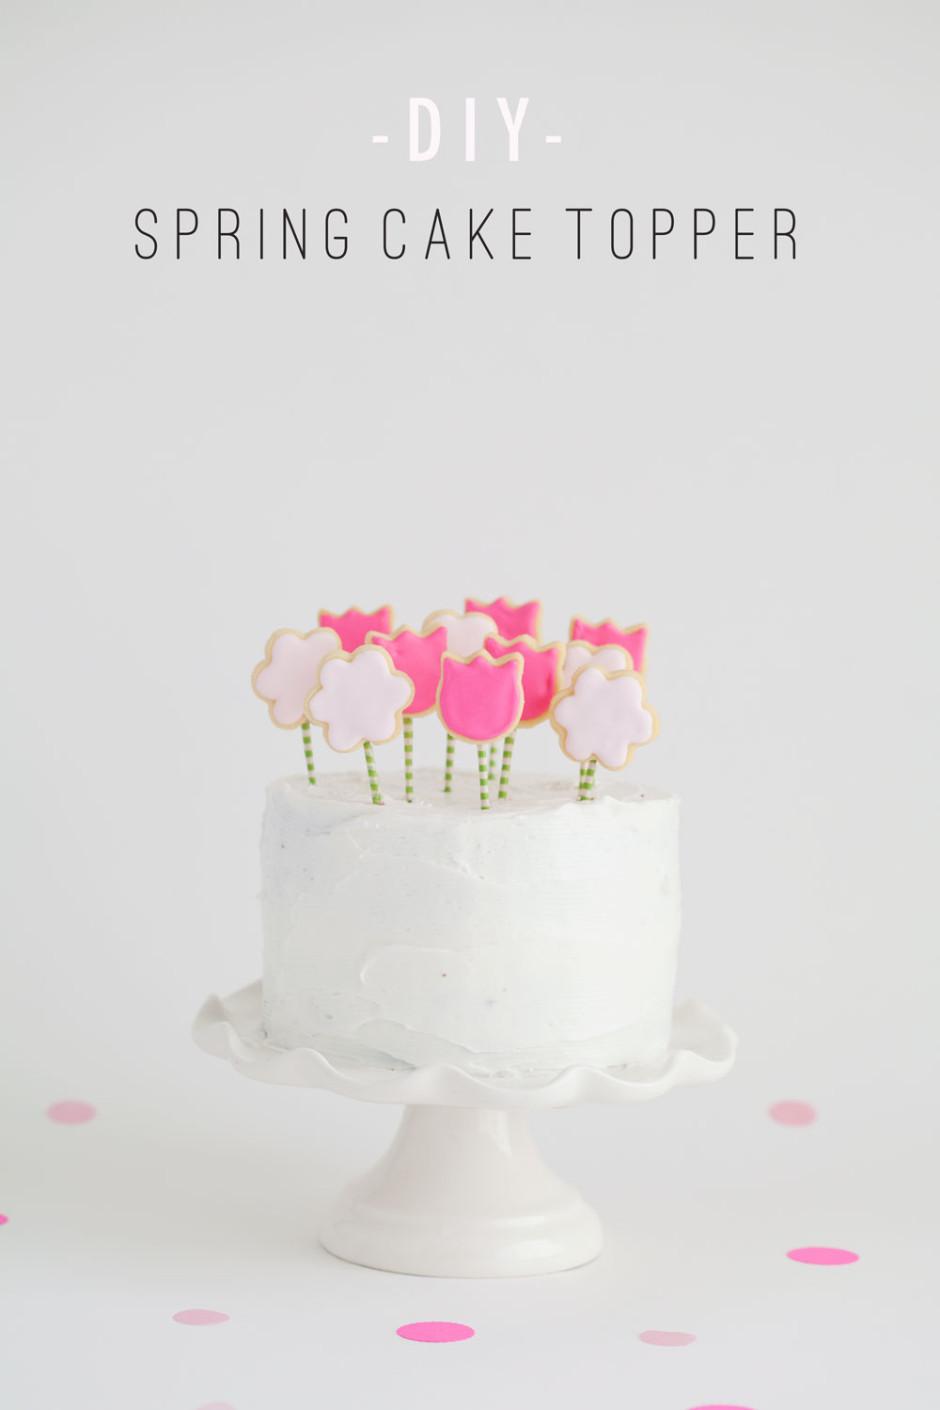 Spring-cake-topper